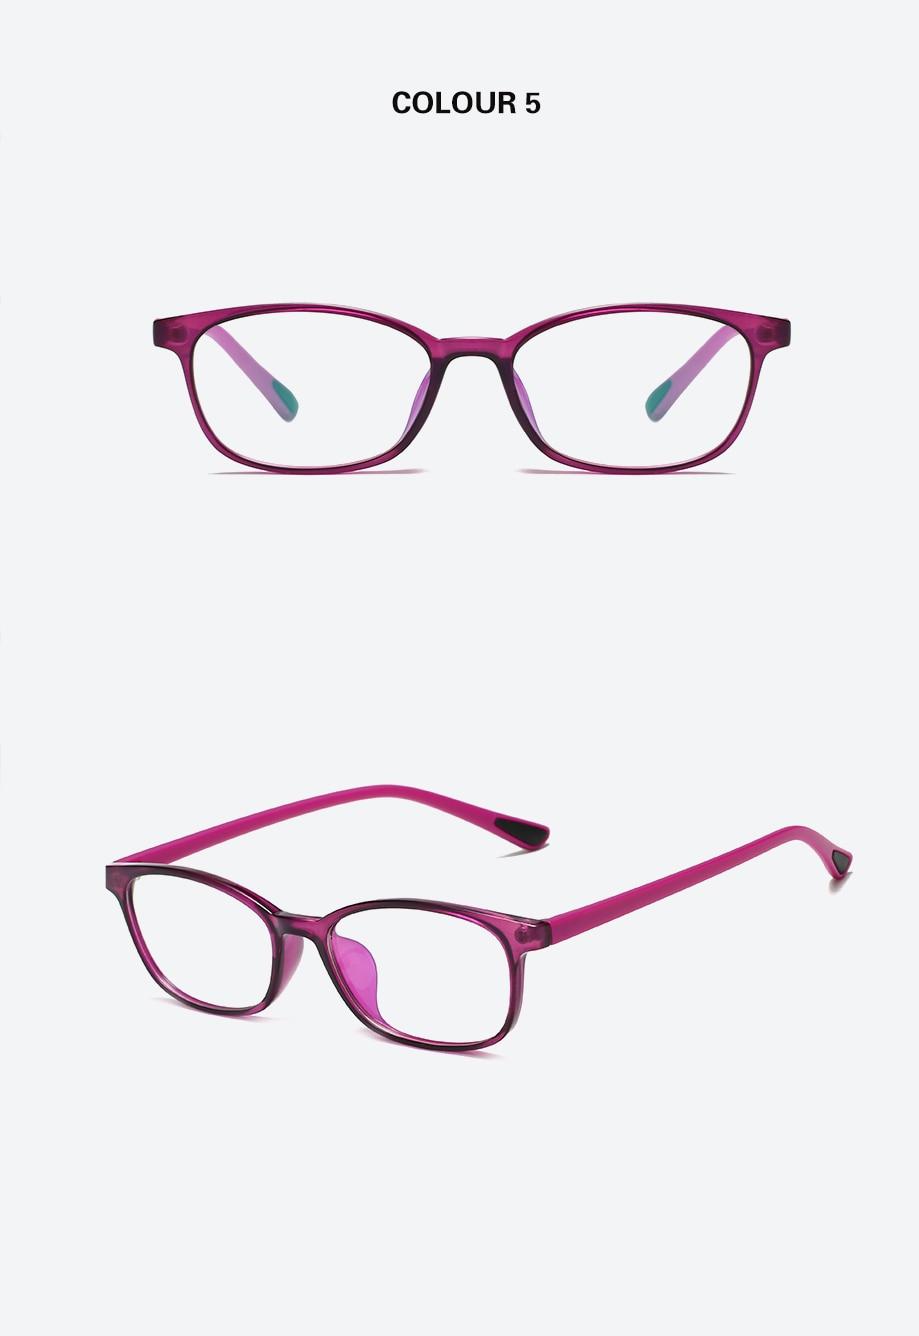 5 Anti-blue glasses